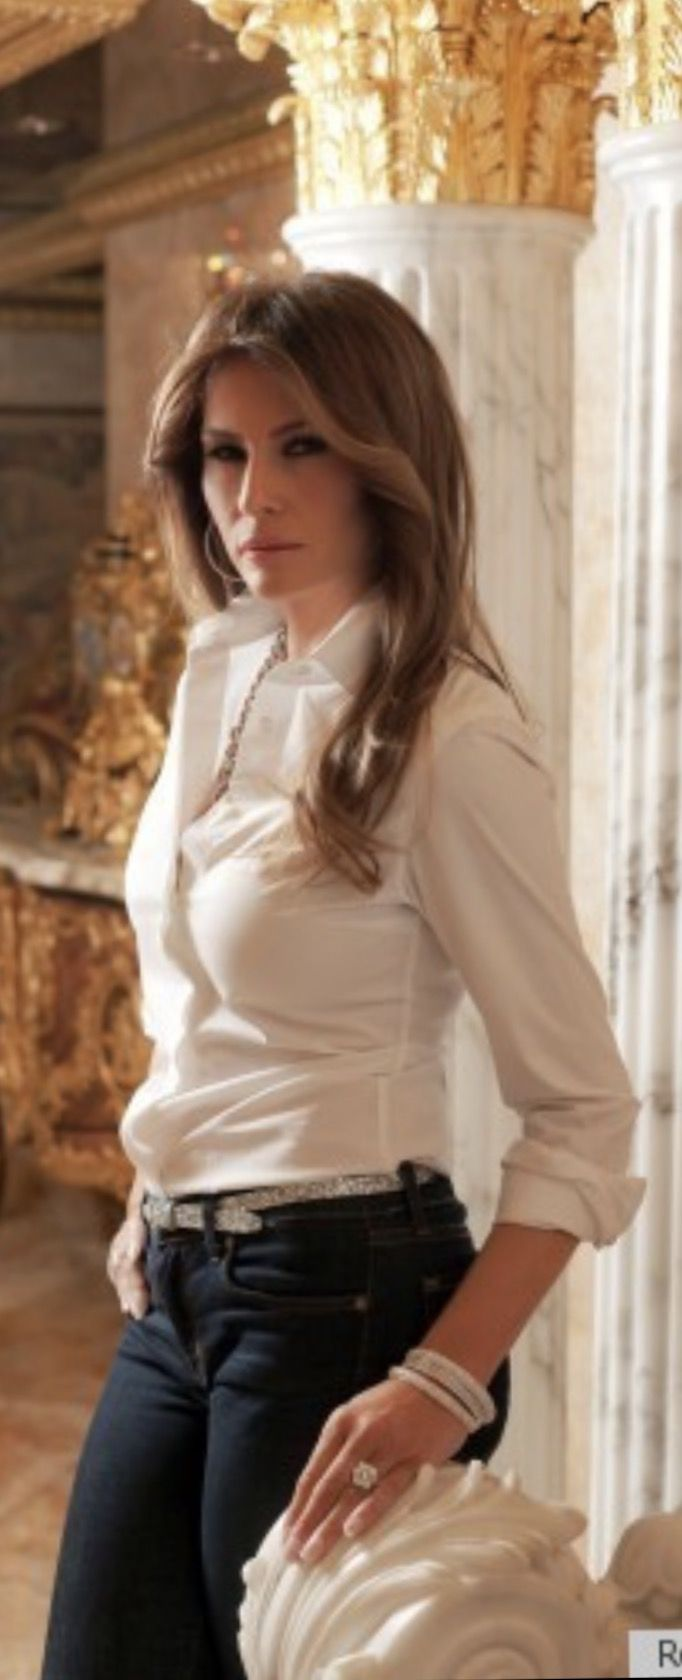 First Lady Melania Trump Melania Trump Pinterest